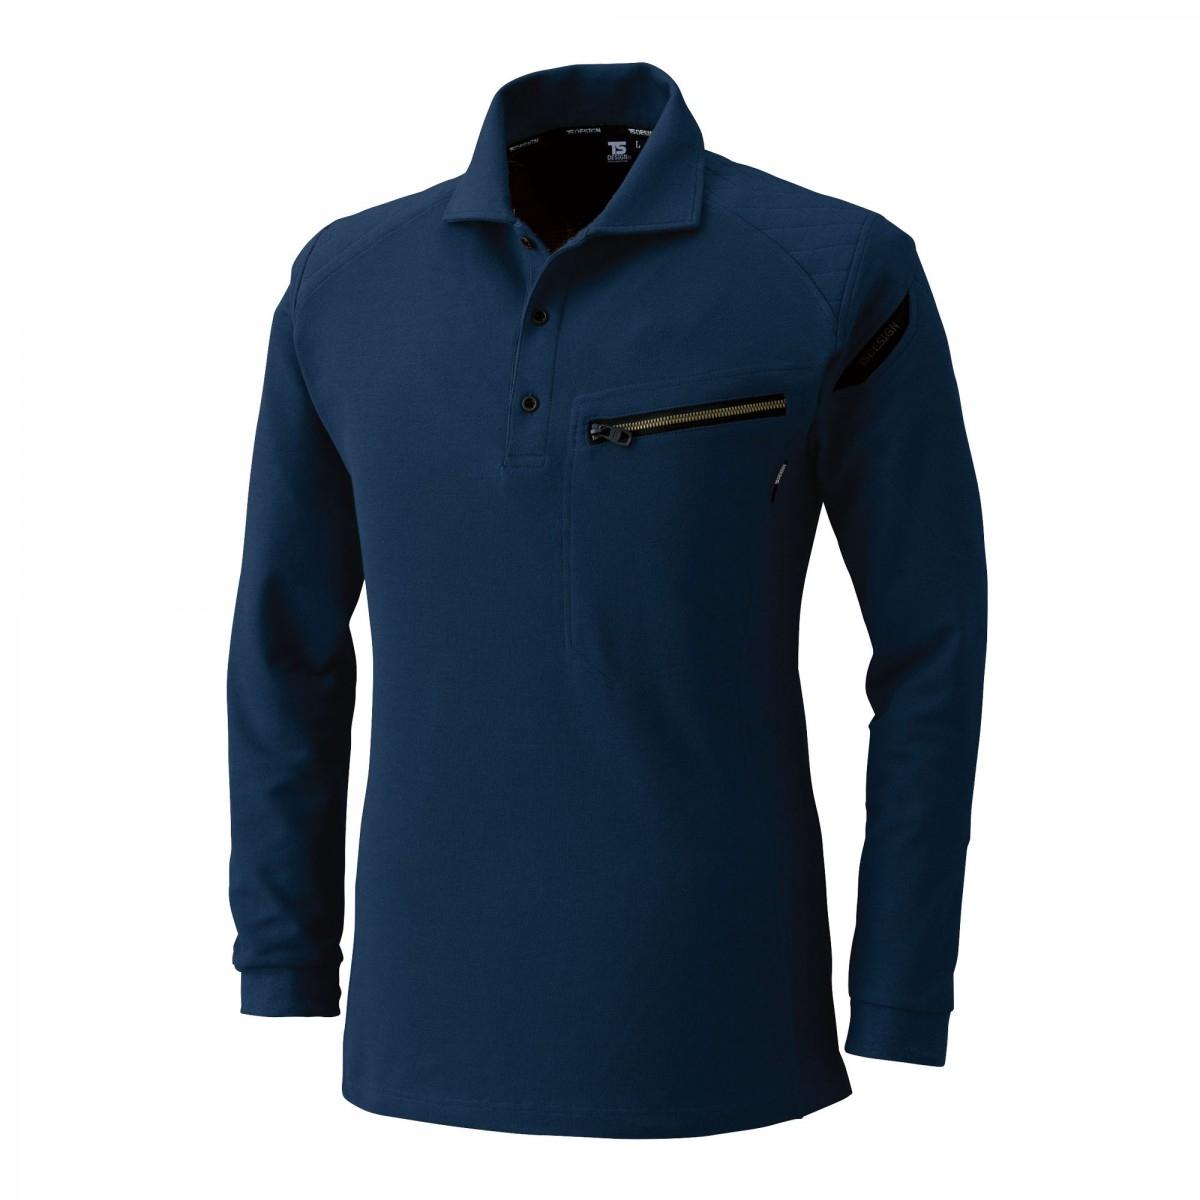 TS DESIGN~TSデザイン~5105 ワークニットロングポロシャツ 45 ネイビー